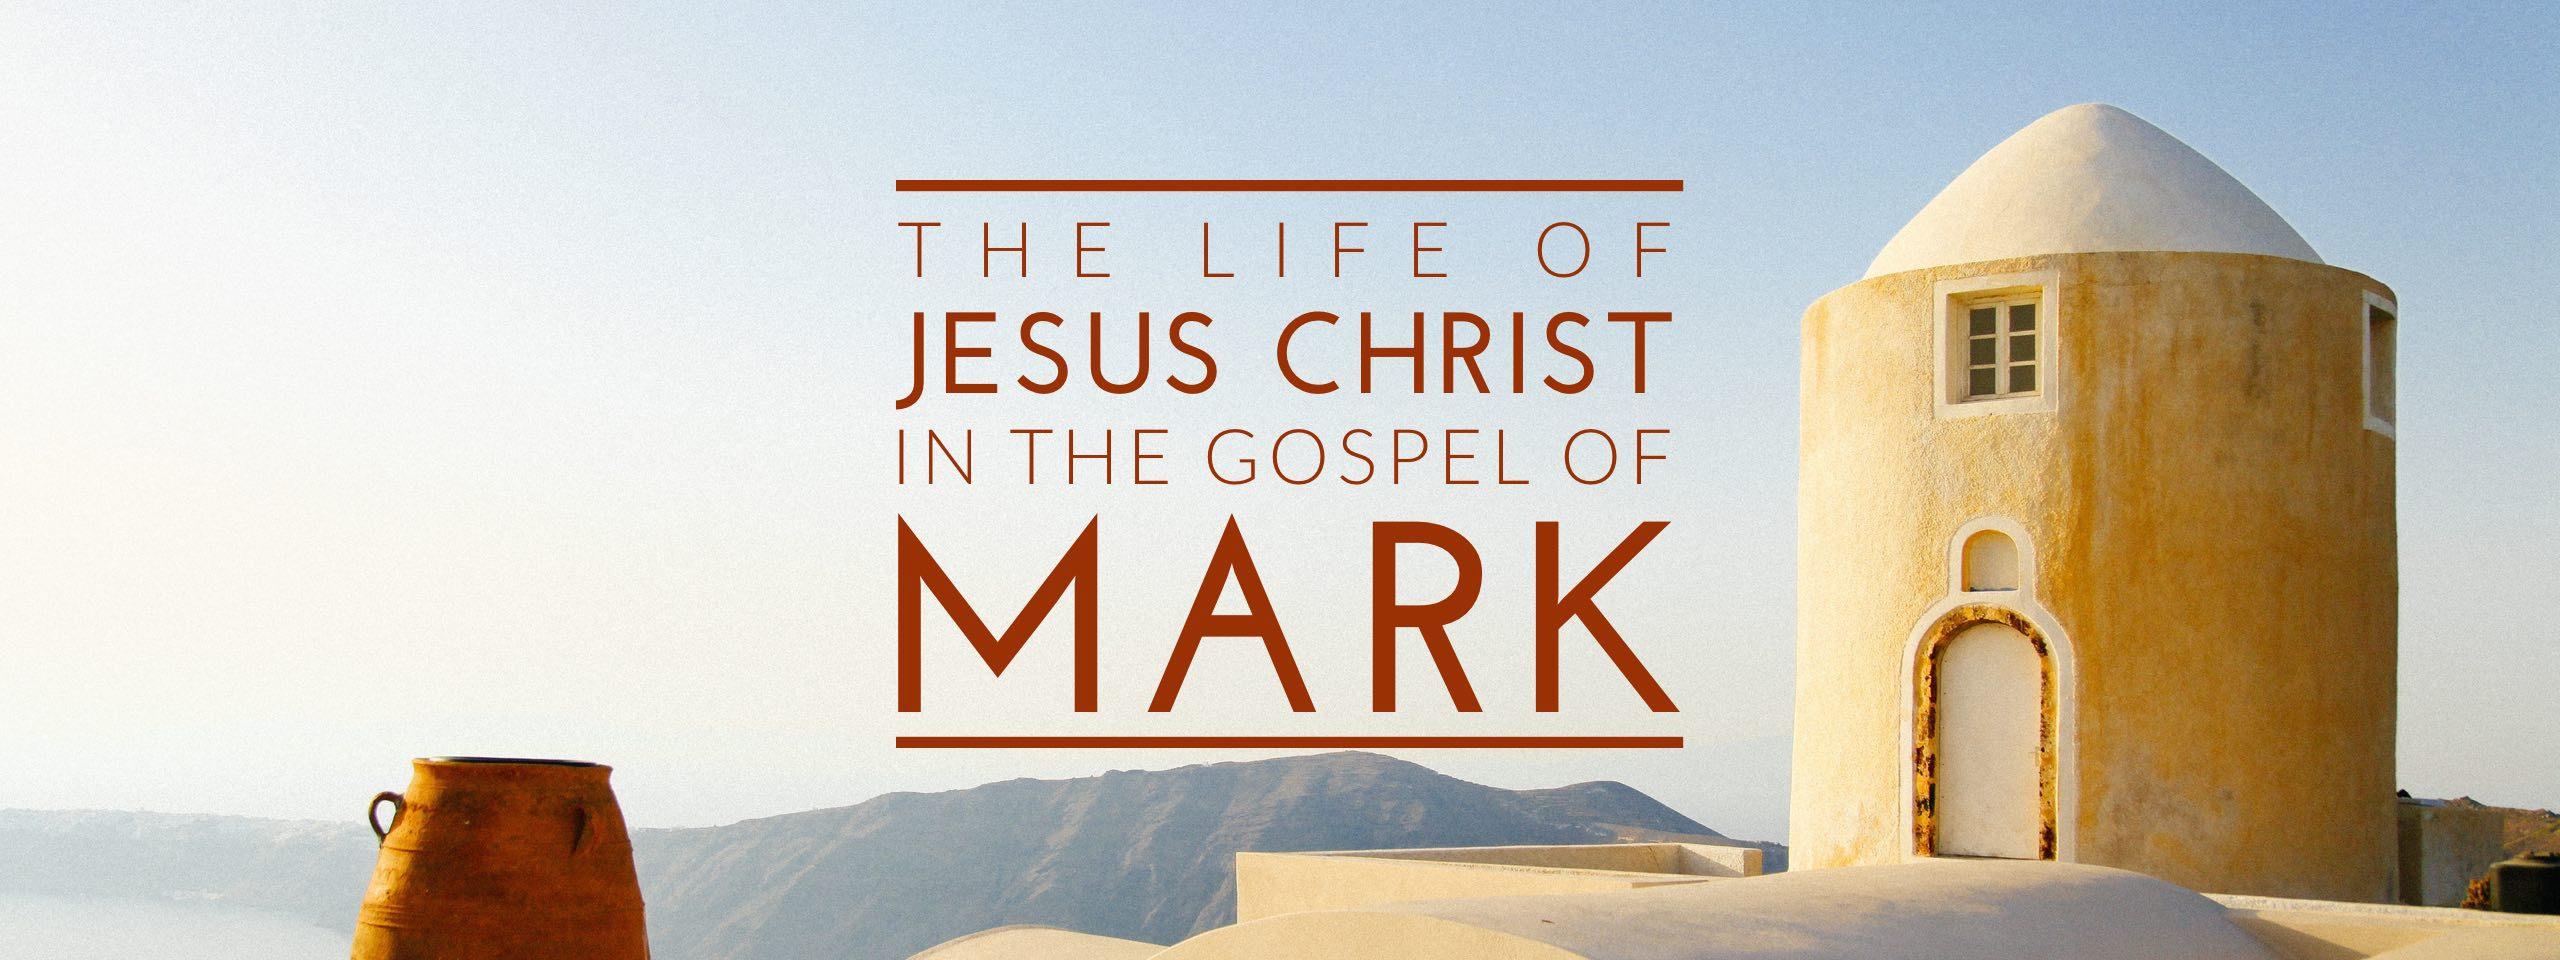 The Life of Jesus Christ in the Gospel of Mark – Sermons